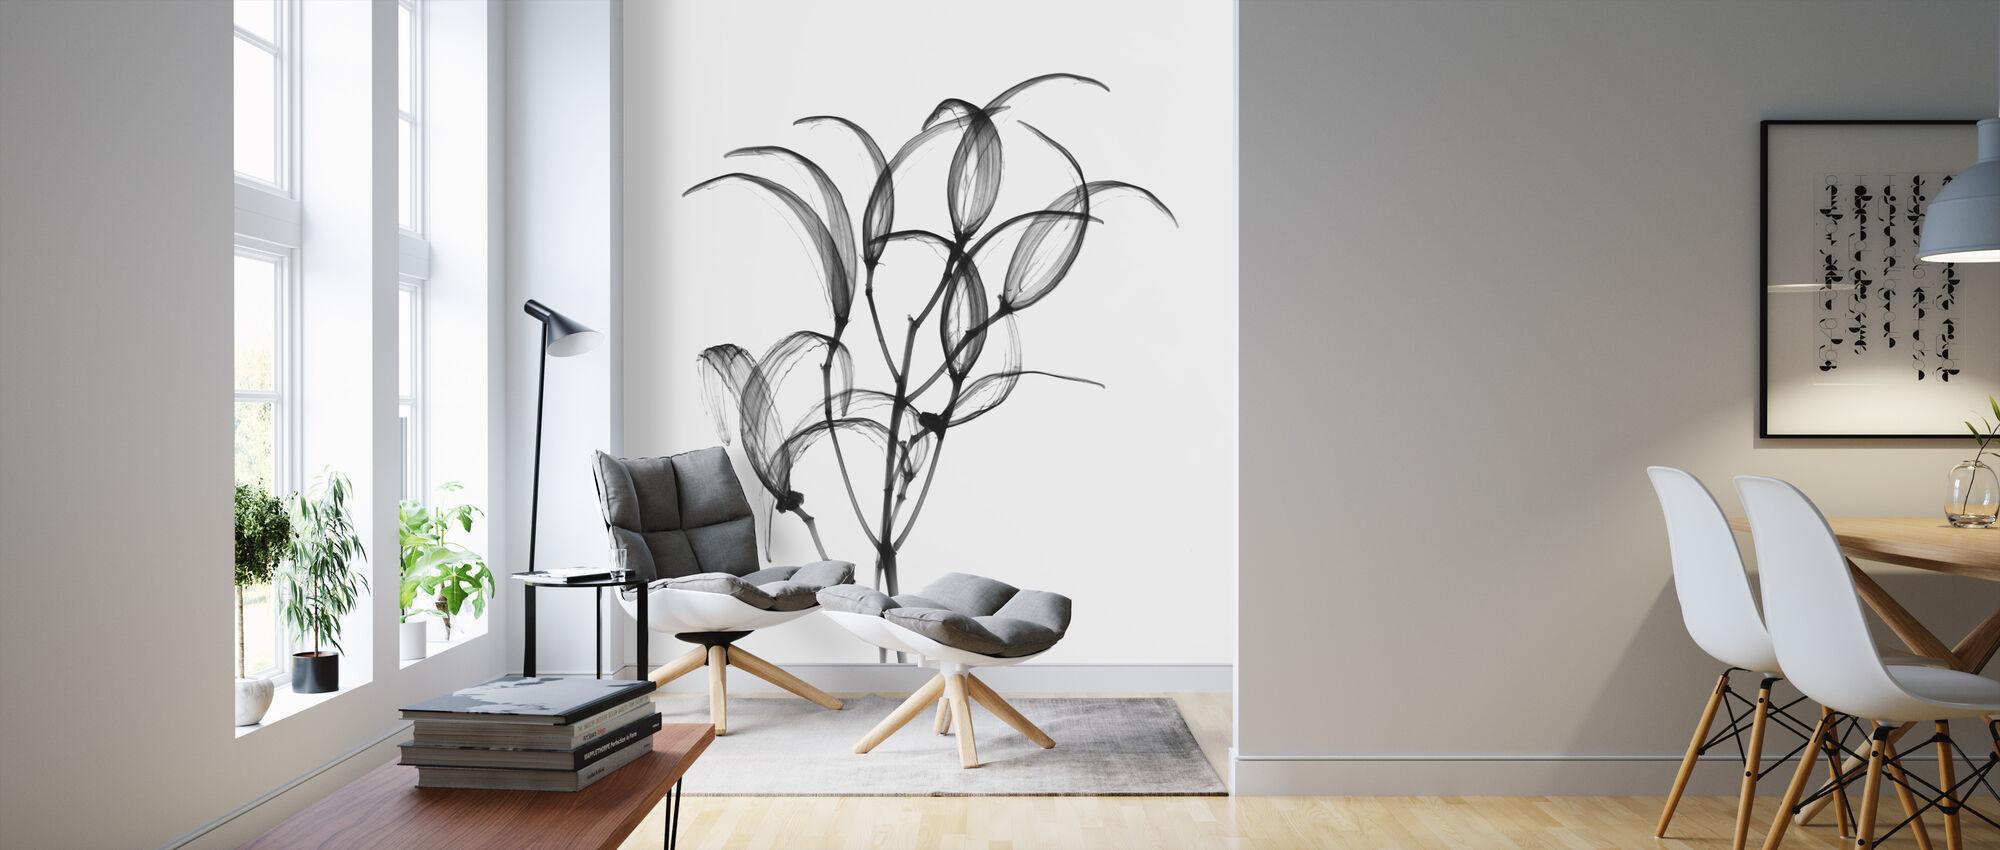 Seedpods Oleander Bush - Wallpaper - Living Room